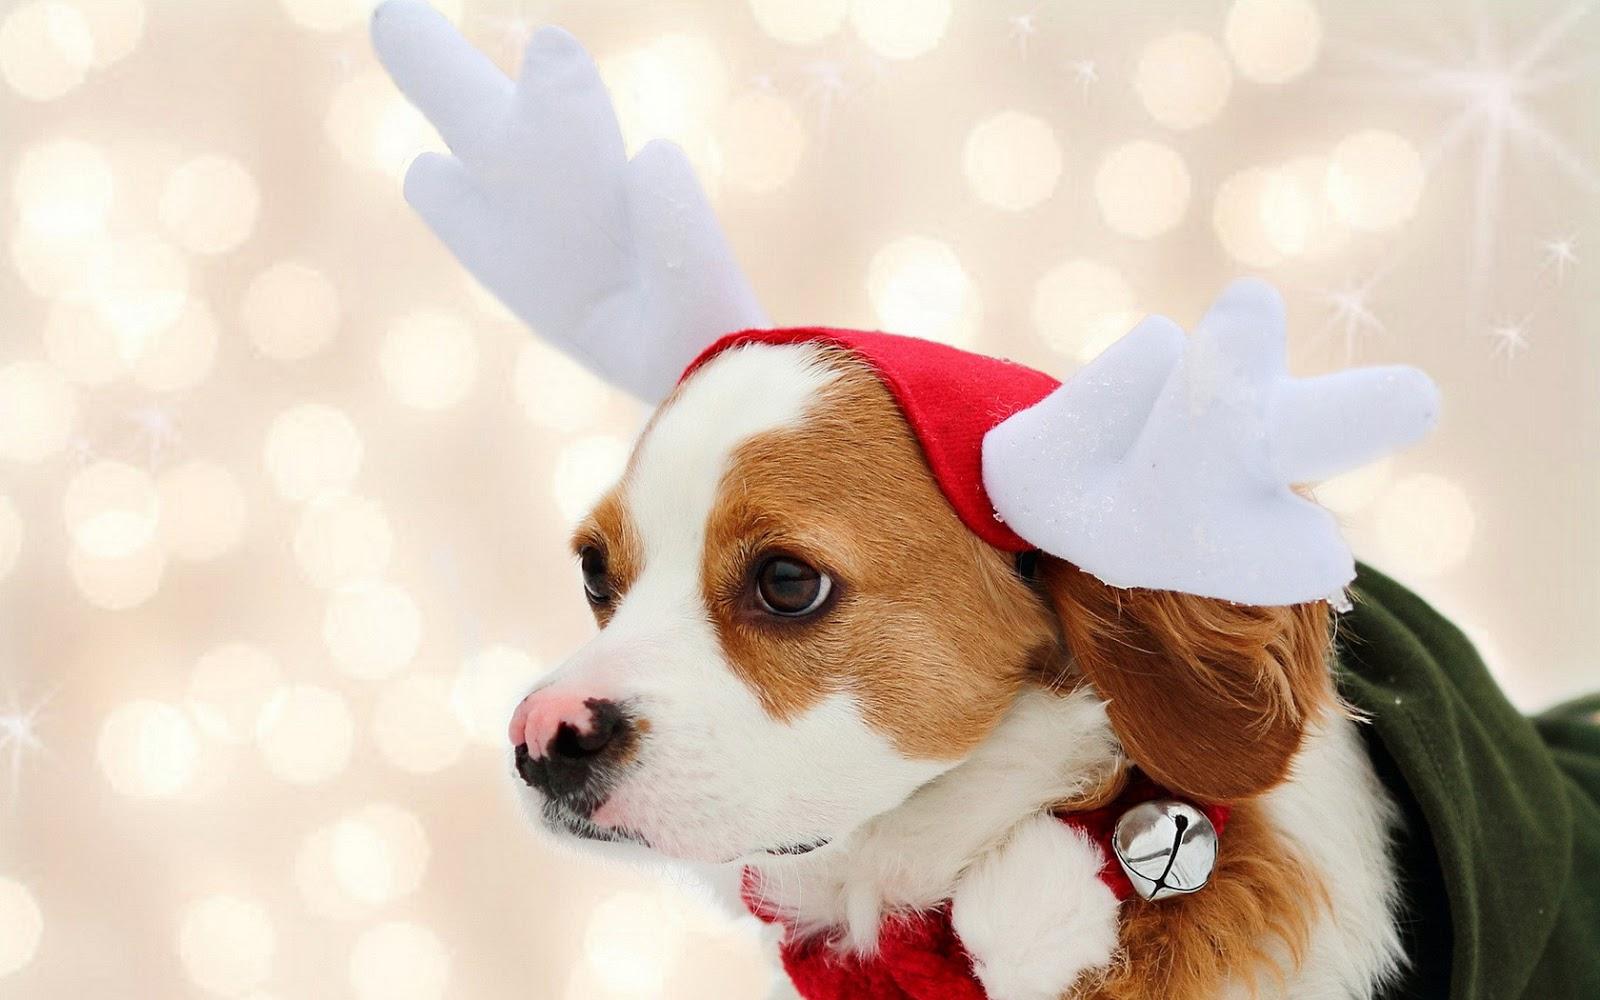 merry christmas wallpapers dogs - HD Desktop Wallpapers | 4k HD